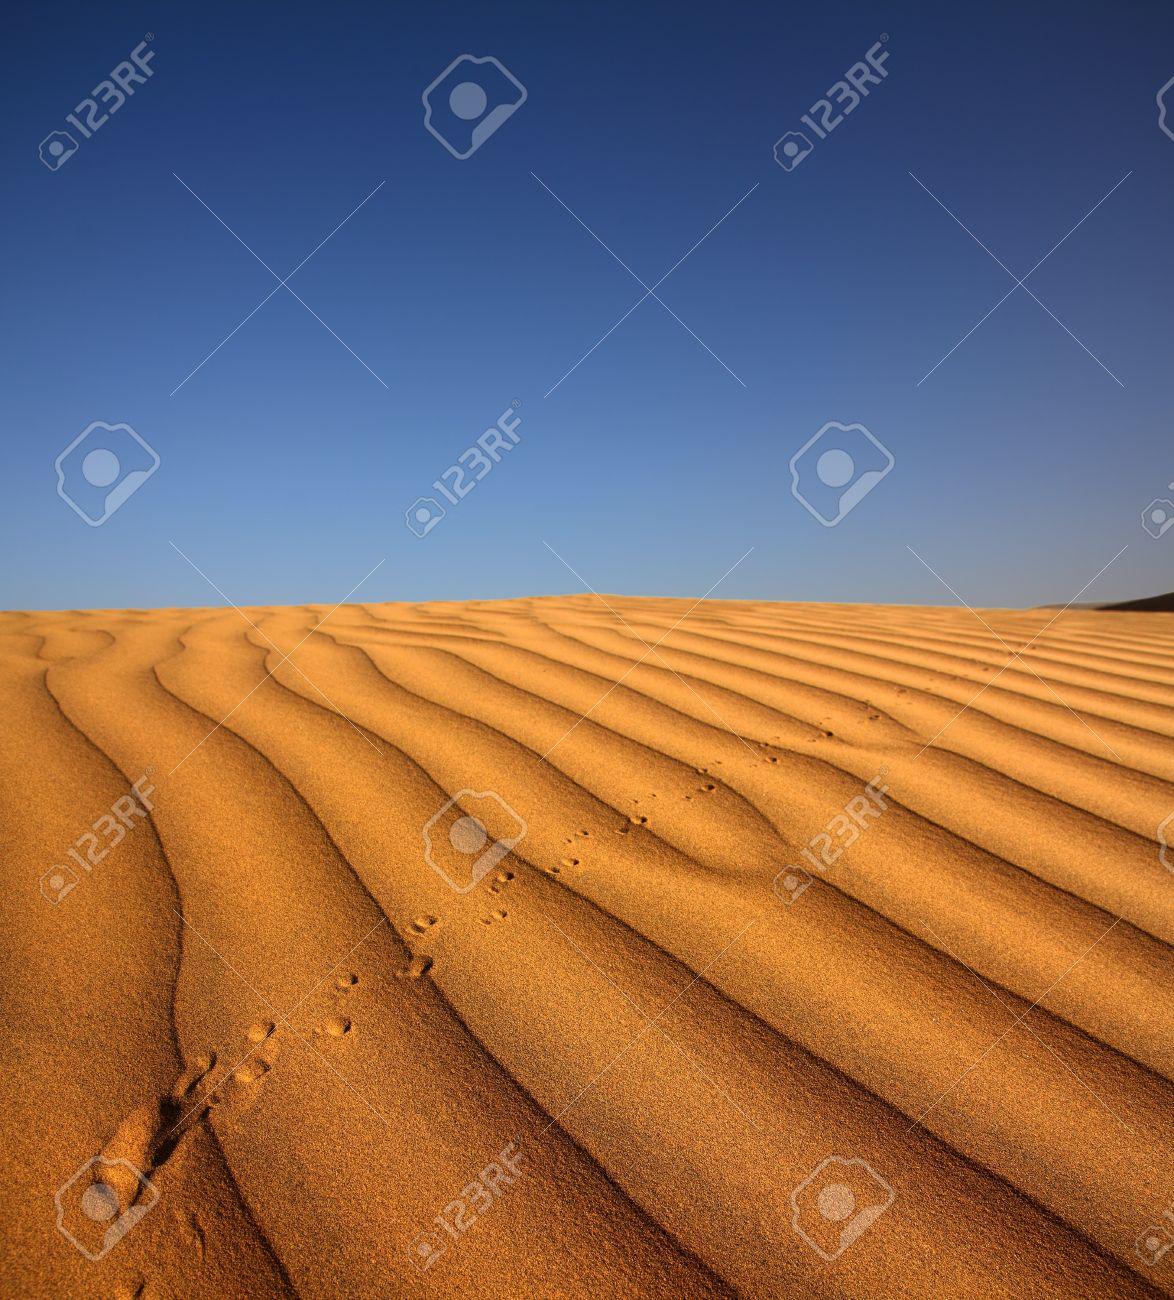 footprint on sand dune in desert at evening Stock Photo - 18640679